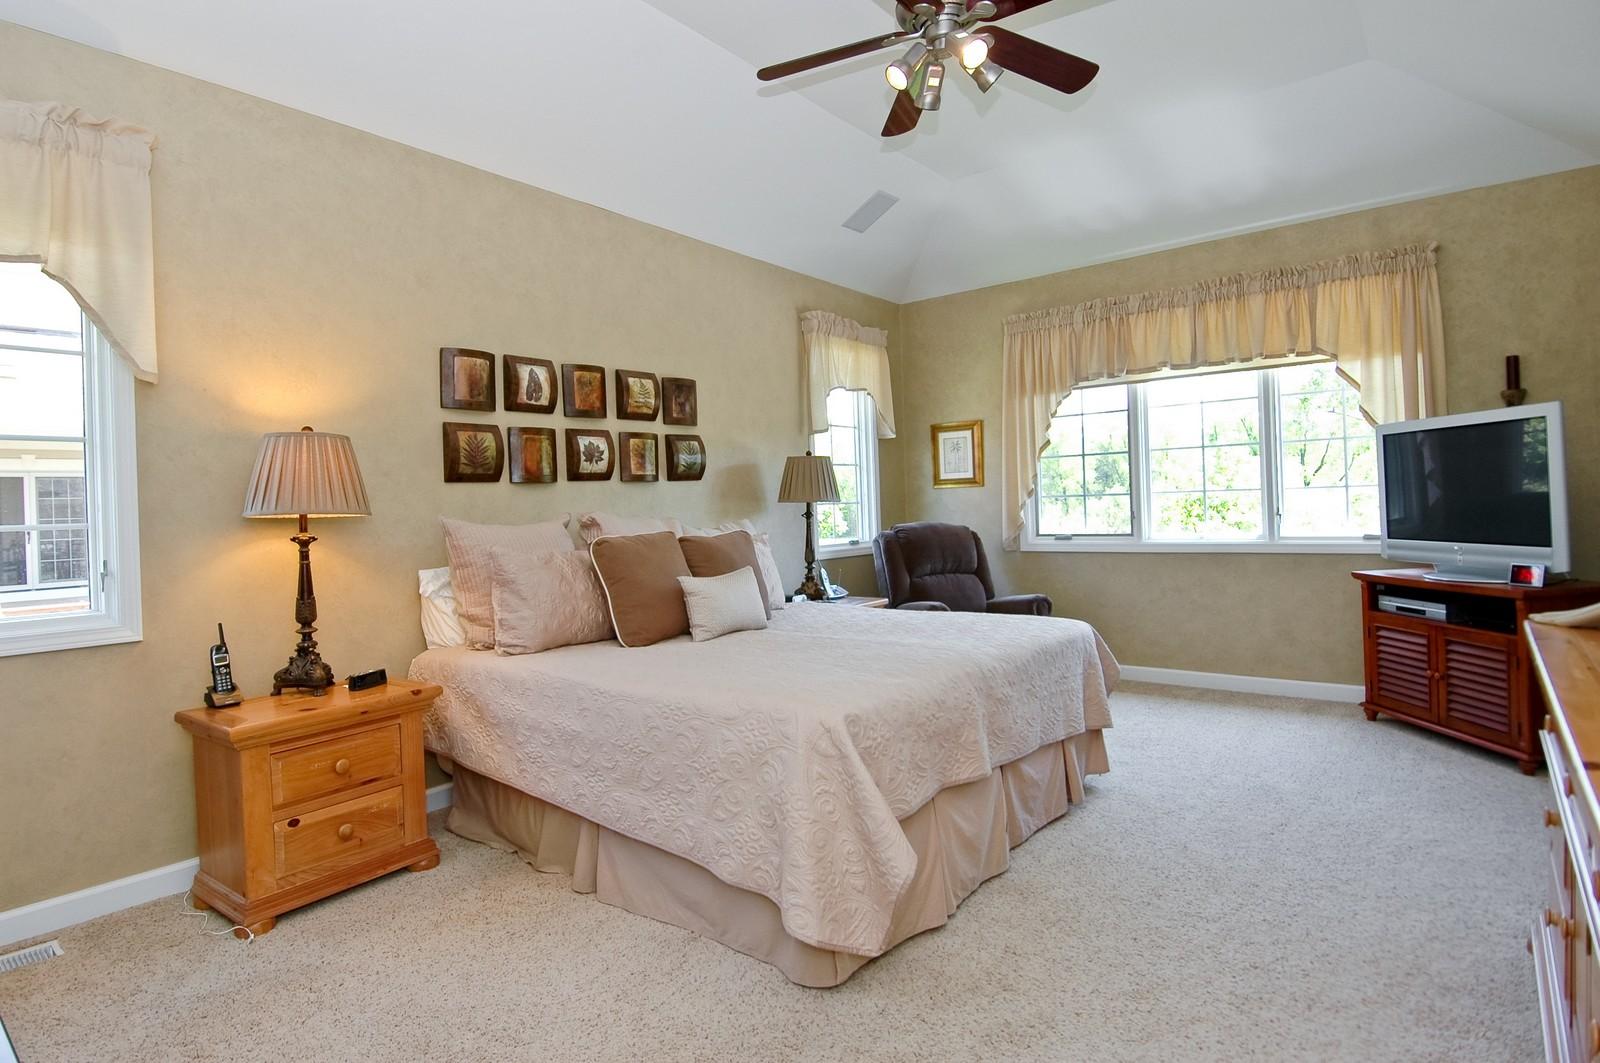 Real Estate Photography - 8719 Shade Tree Circle, Village of Lakewood, IL, 60014 - Master Bedroom